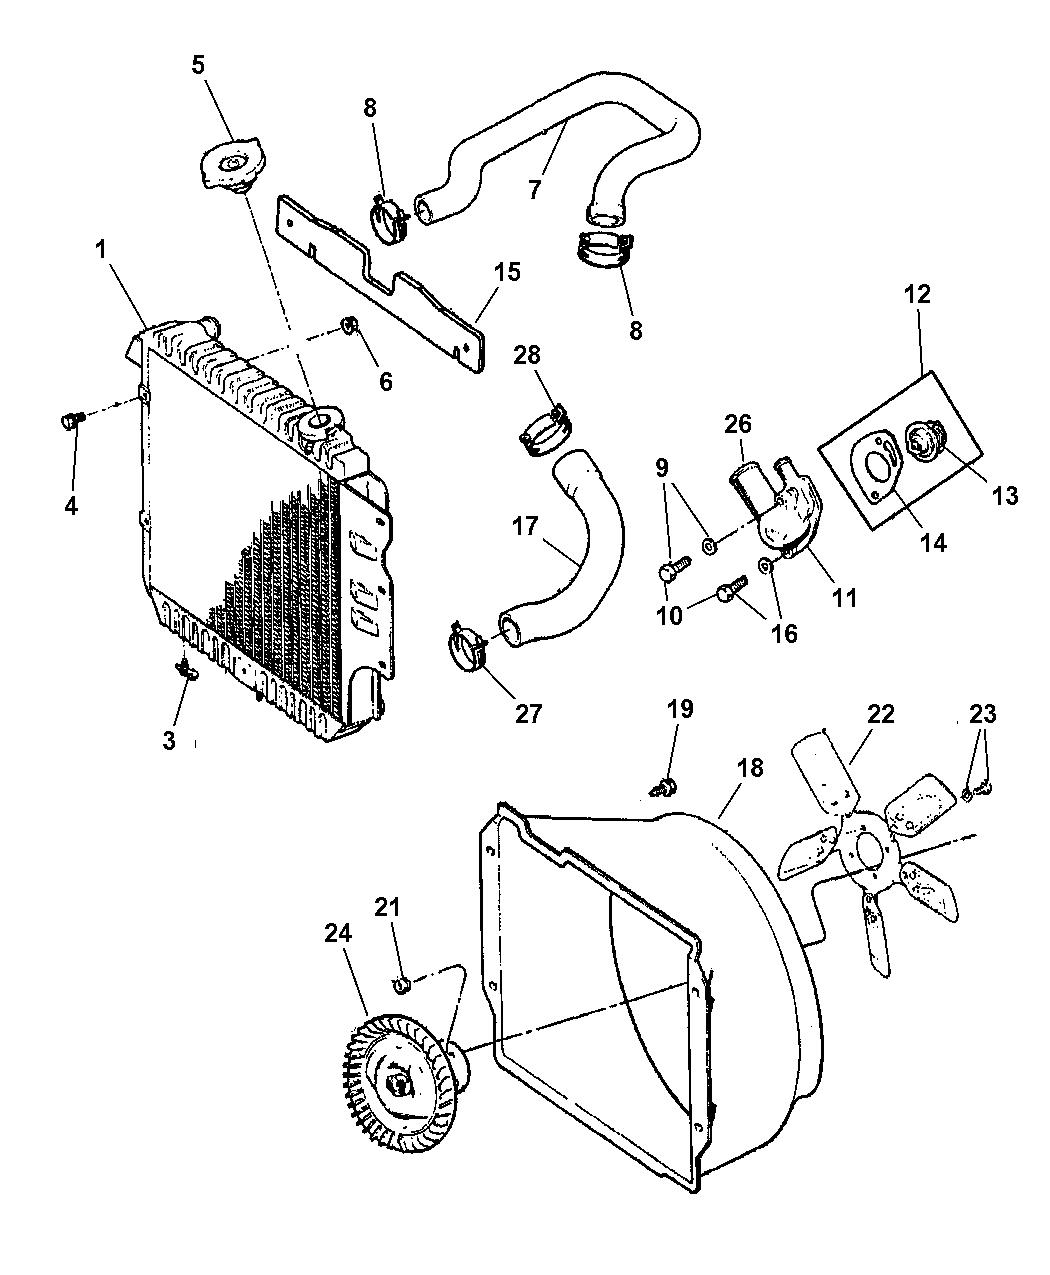 Sophisticated 2004 Jeep Wrangler Parts Diagram Photos